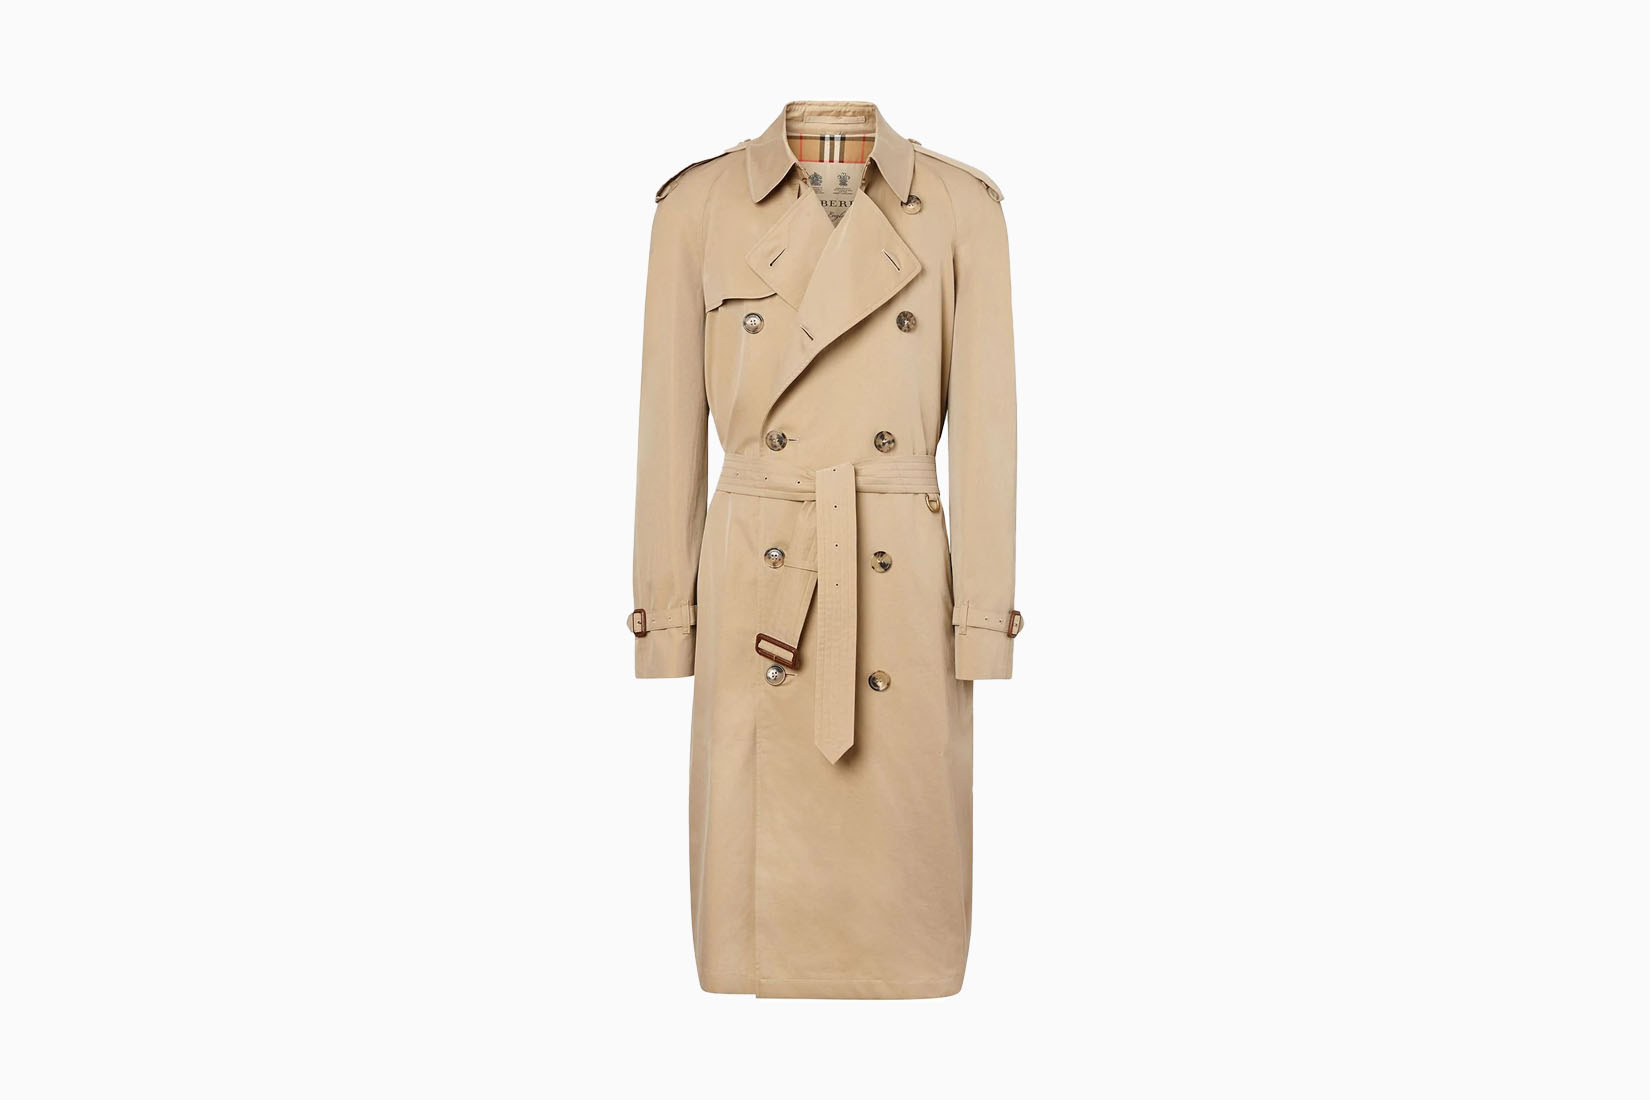 best men trench coats burberry westminster review Luxe Digital